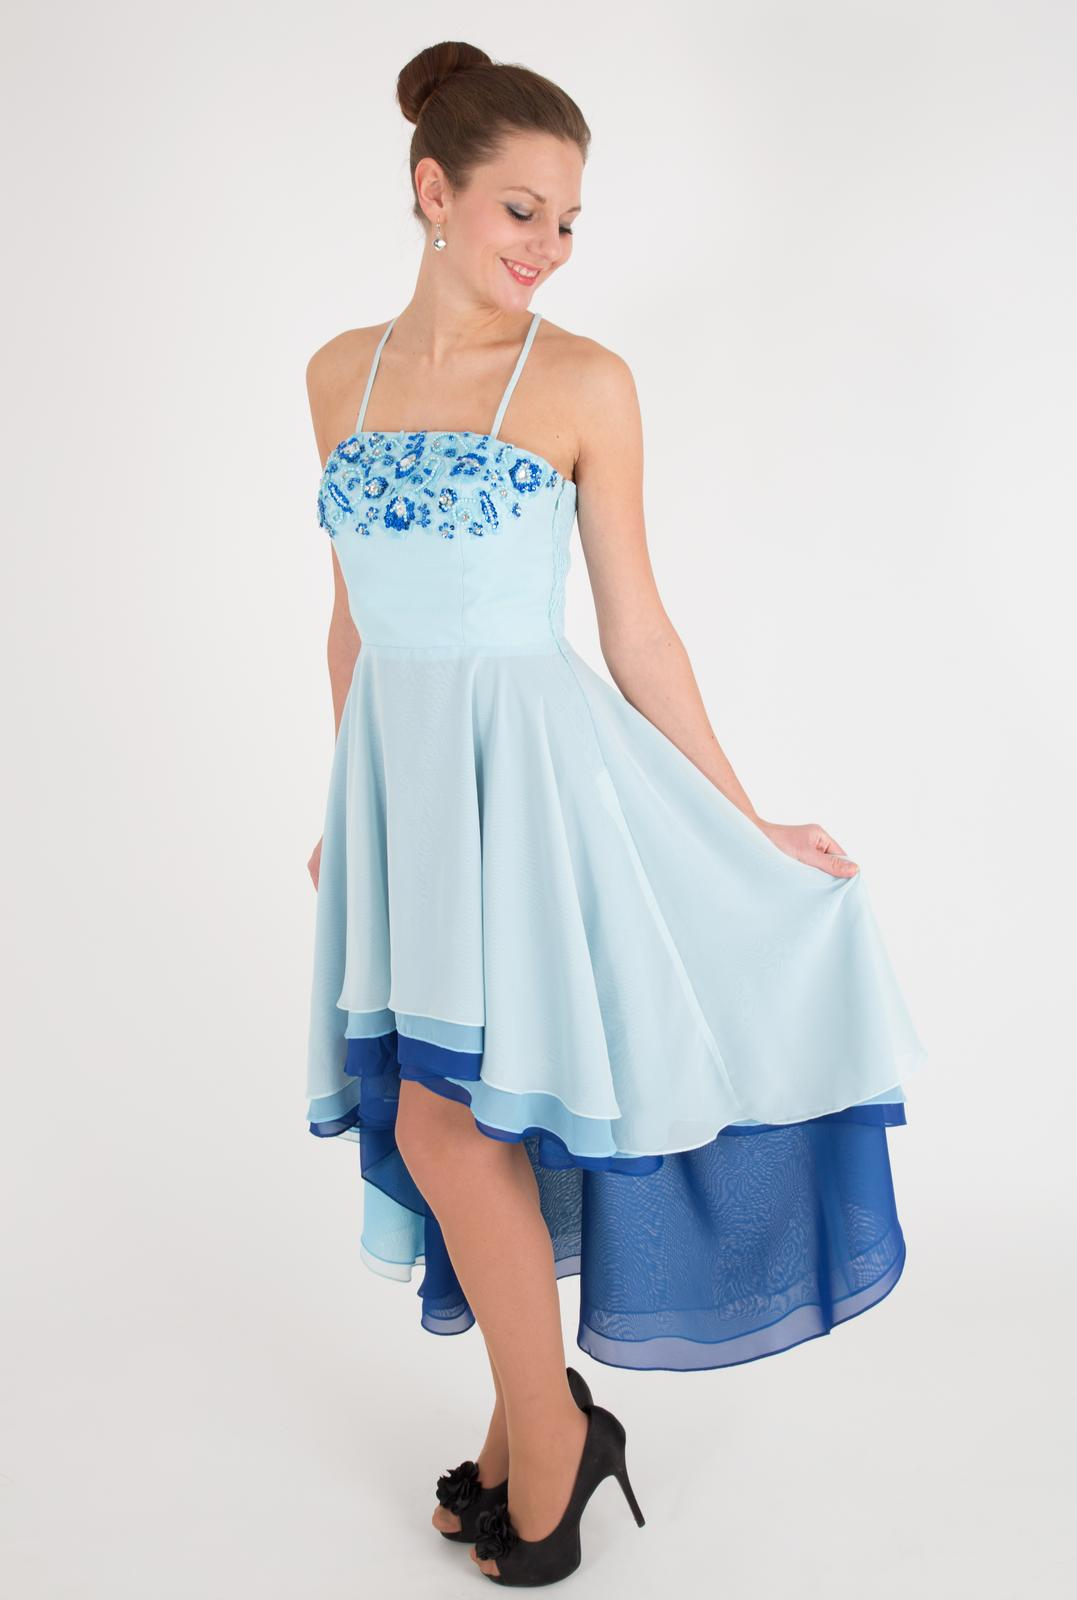 Šaty  Blankyt - Obrázek č. 1